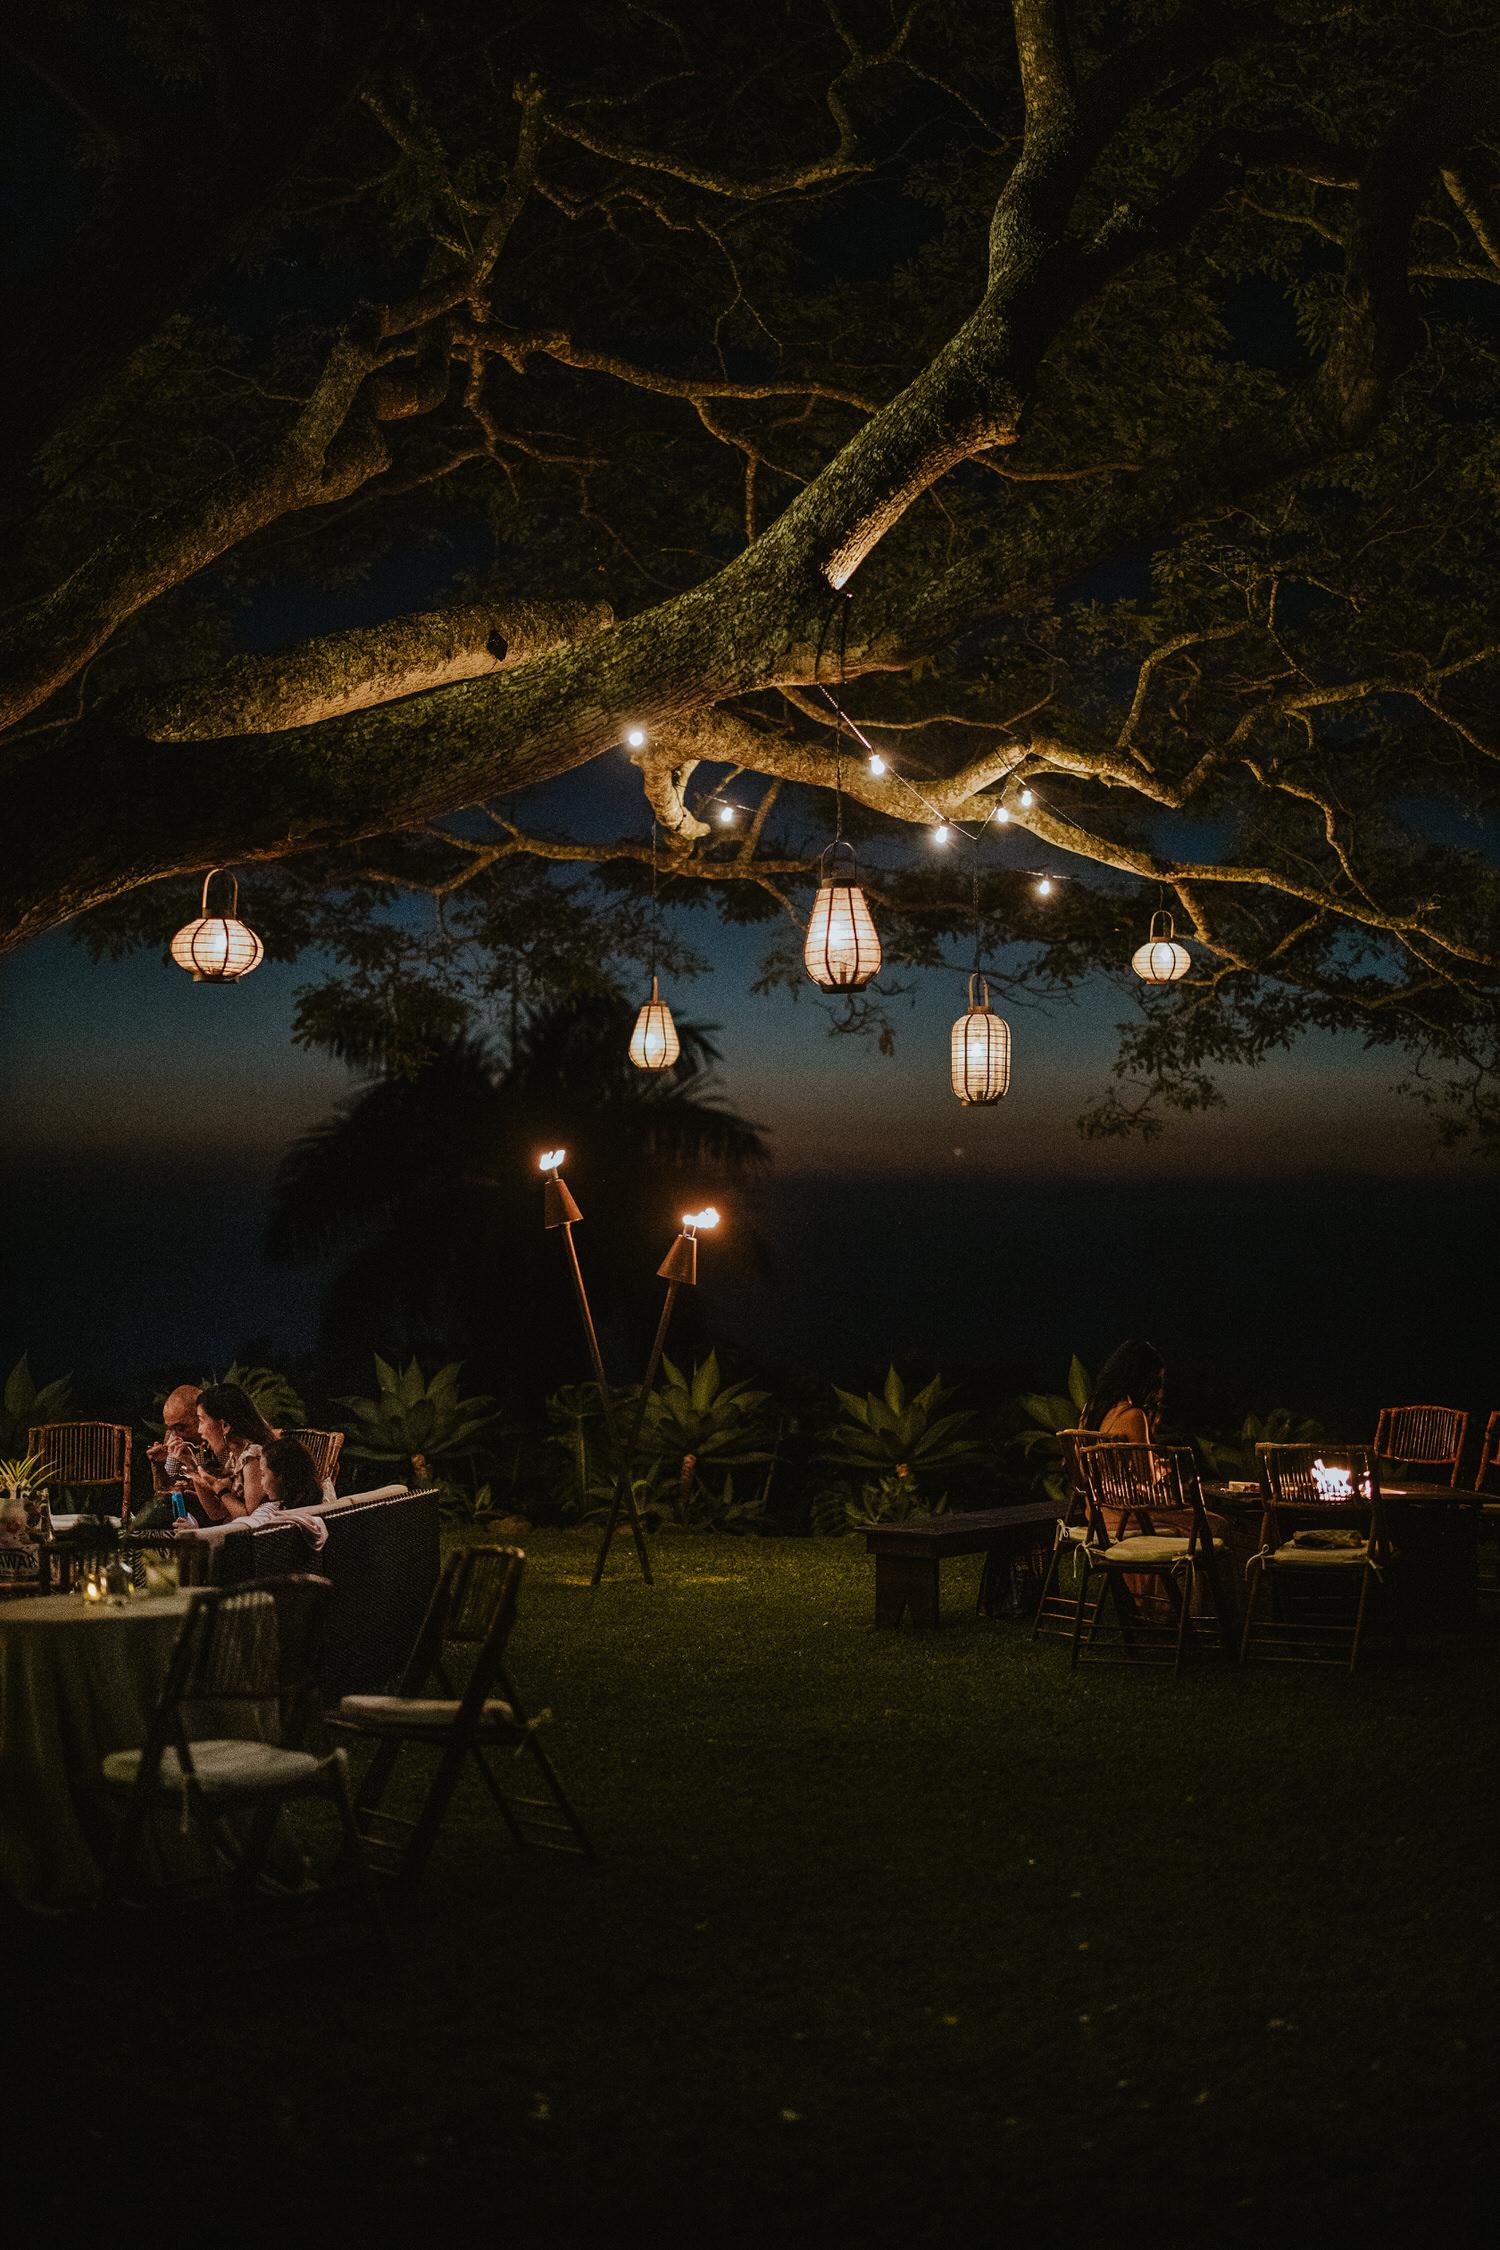 holualoa inn, mauna lani pavilion wedding, red barn holualoa inn, mauna lani pavilion wedding, mauna lani weddings, big island tents, big island tents wedding